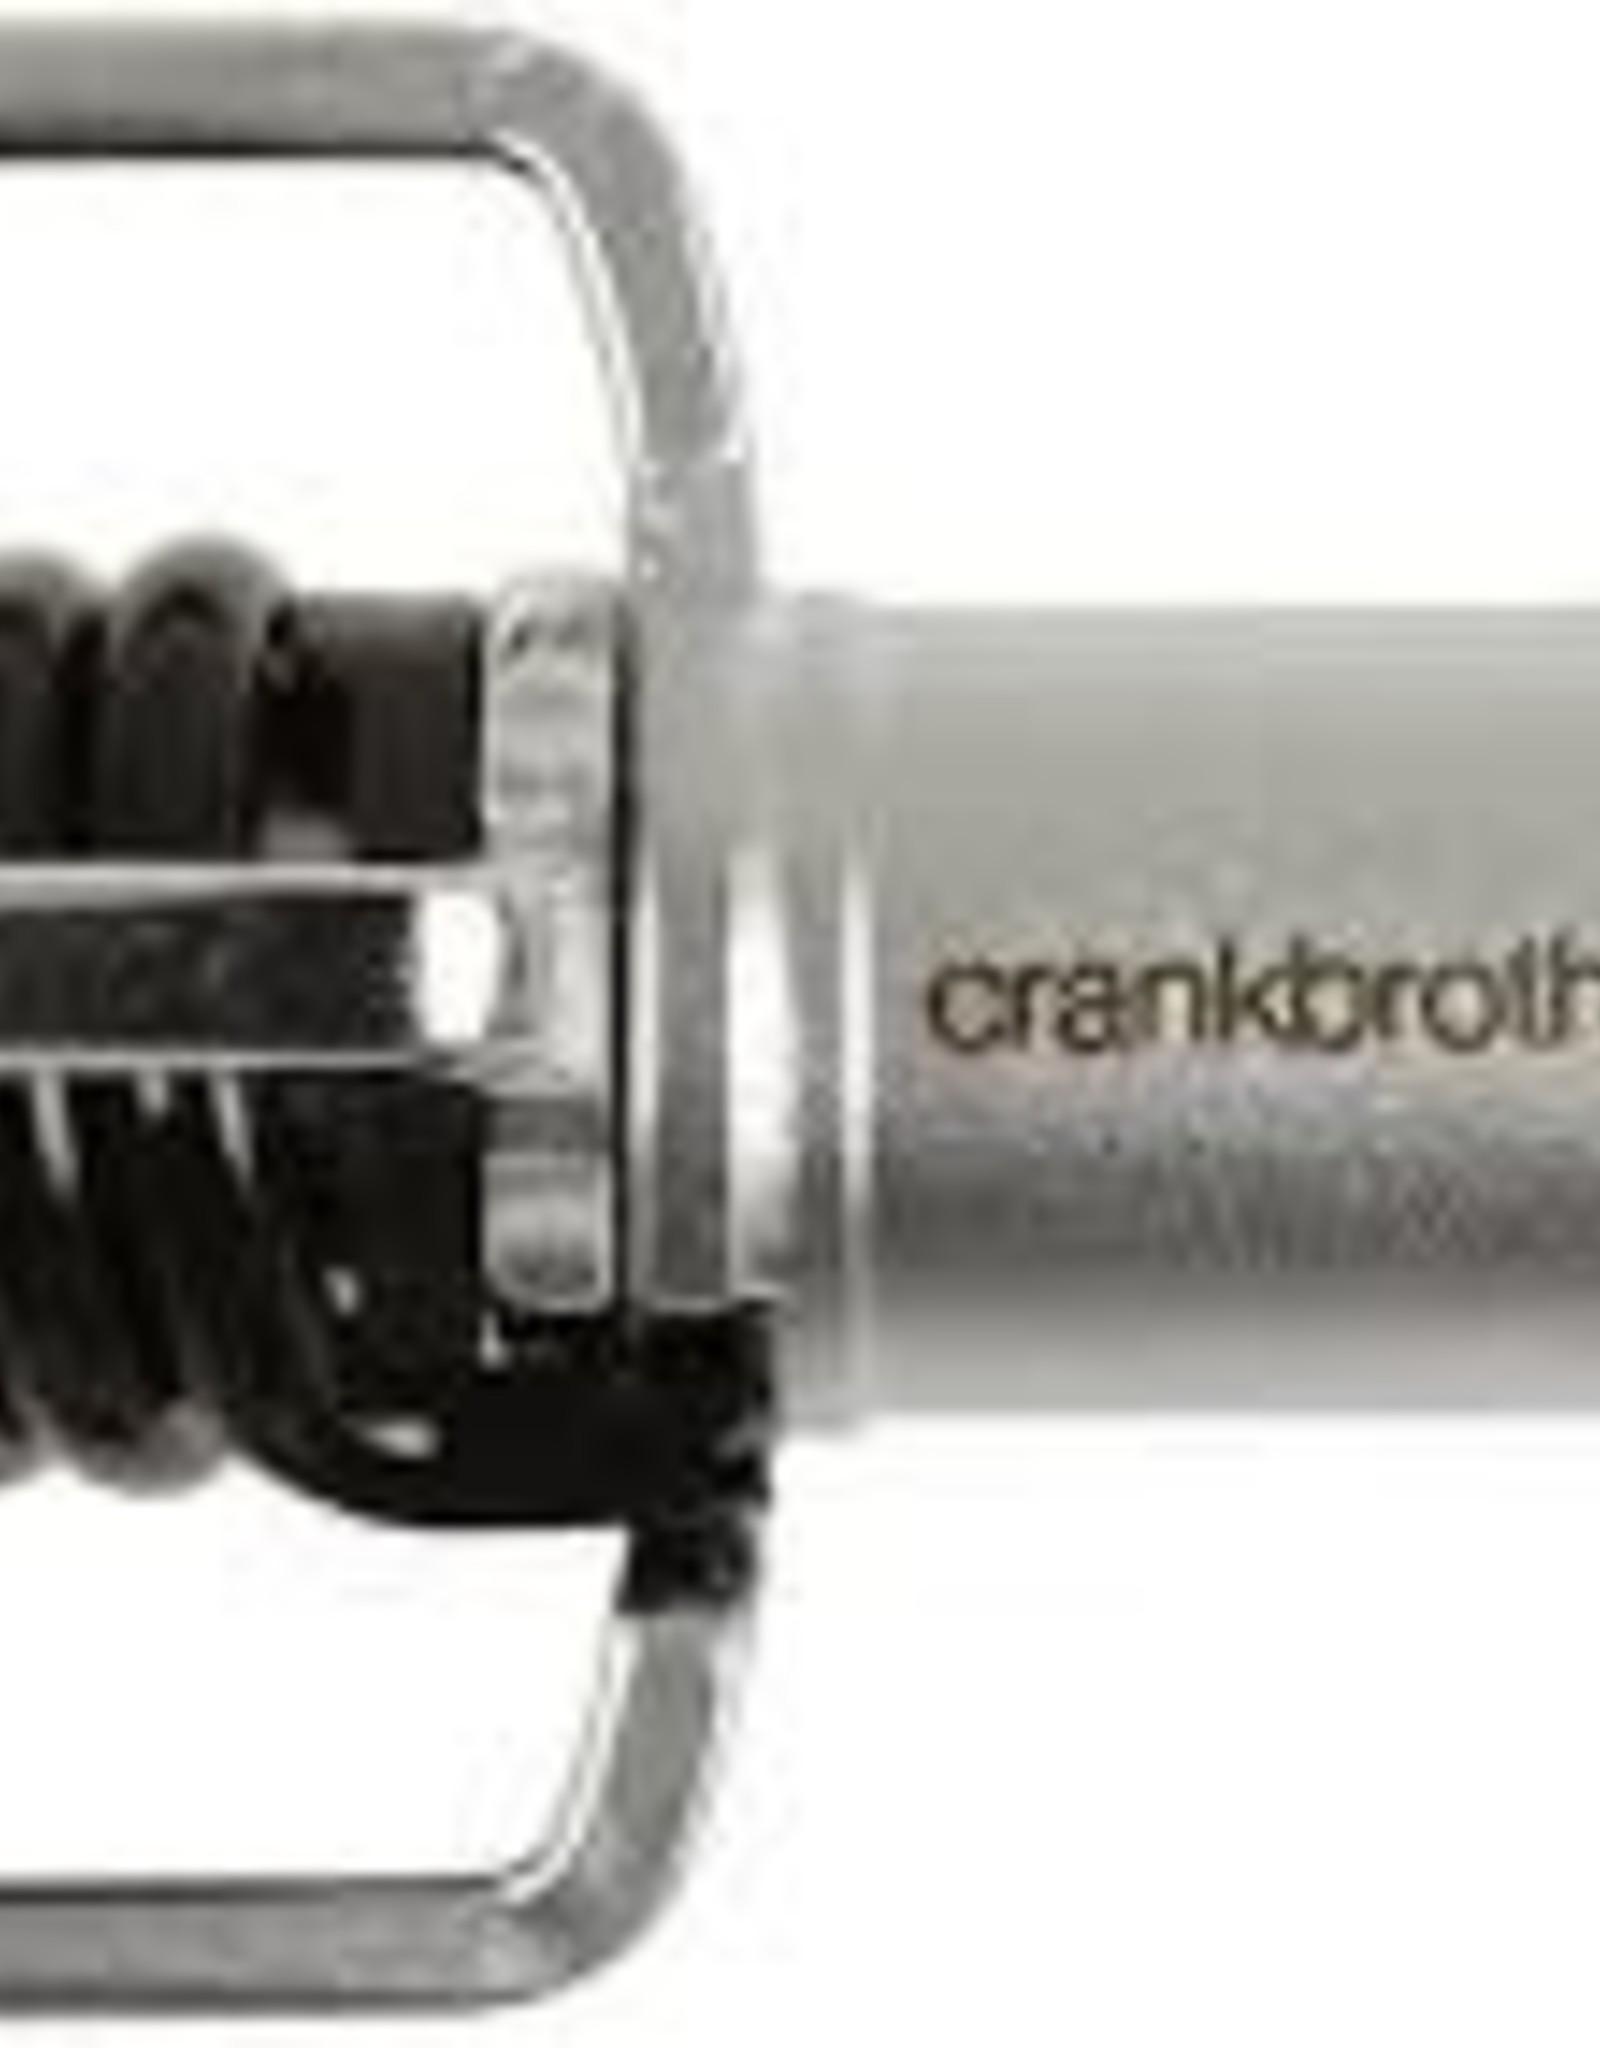 CRANK BROTHERS CRANKBRO EGGBTR 1 PDL BLK SPRN